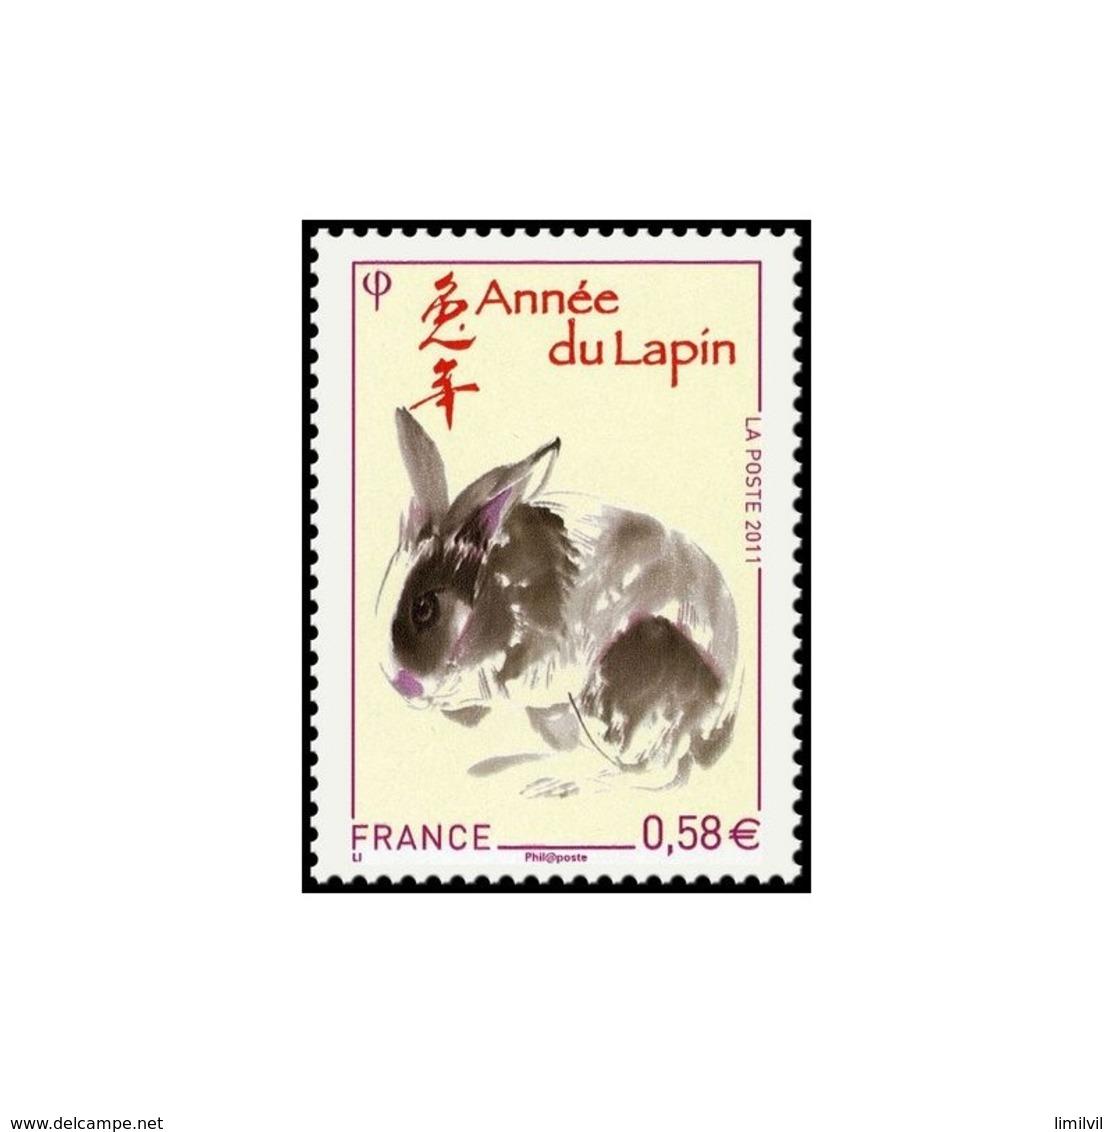 Timbre N° 4531 Neuf ** - Année Chinoise Du Lapin. Lapin Et Idéogramme. - Nuovi